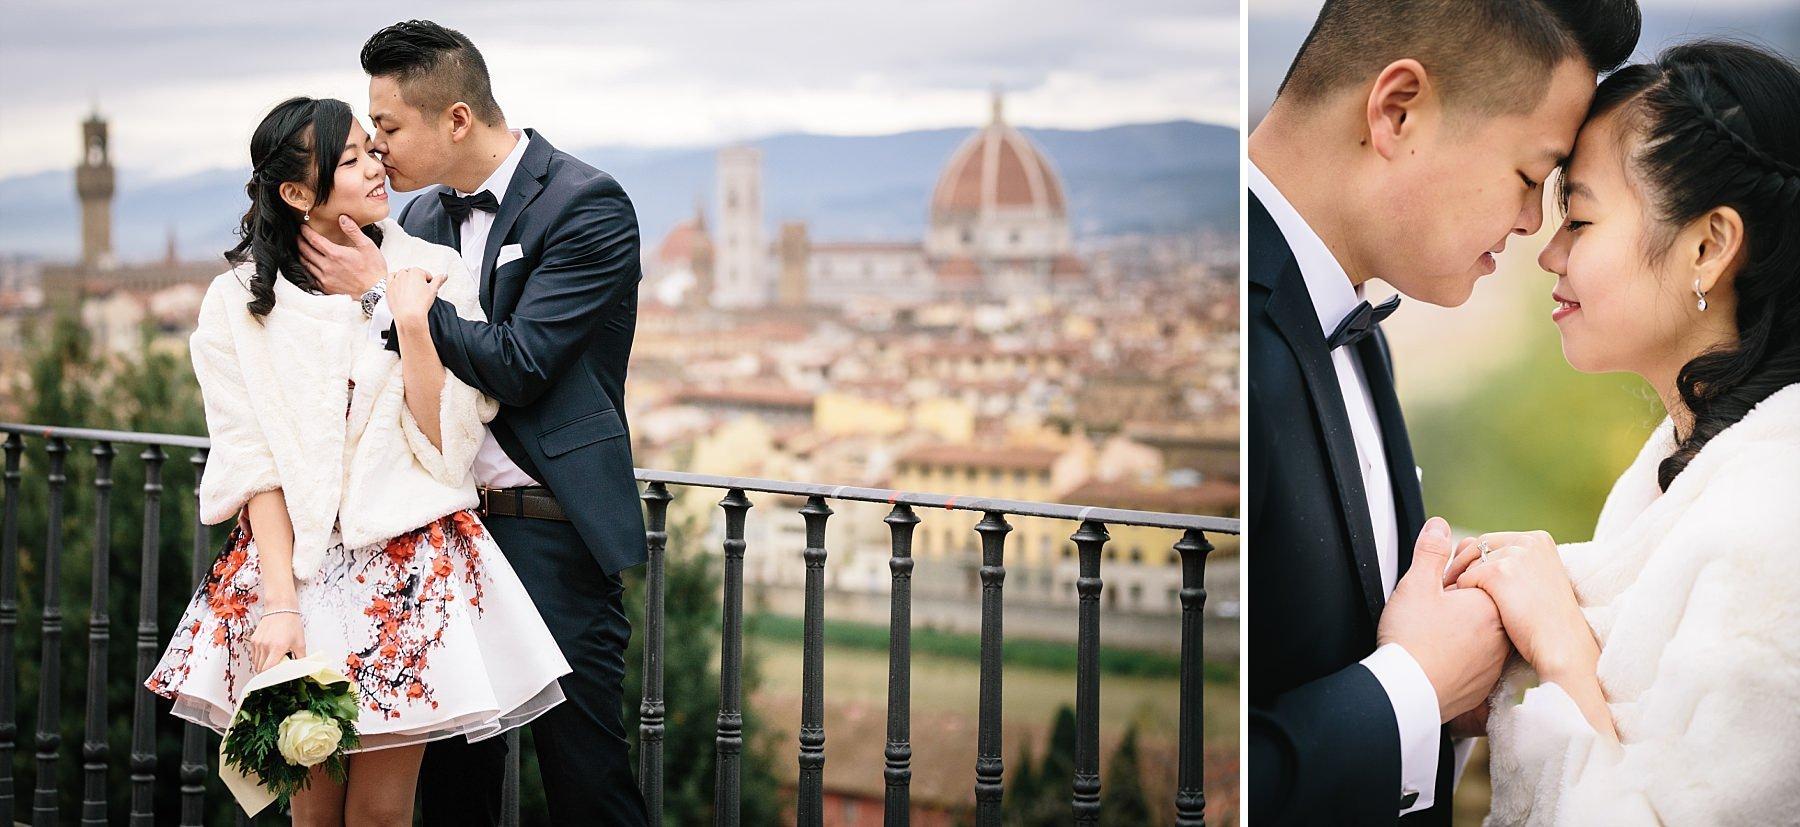 fotografo di matrimoni a firenze four seasons 10 1